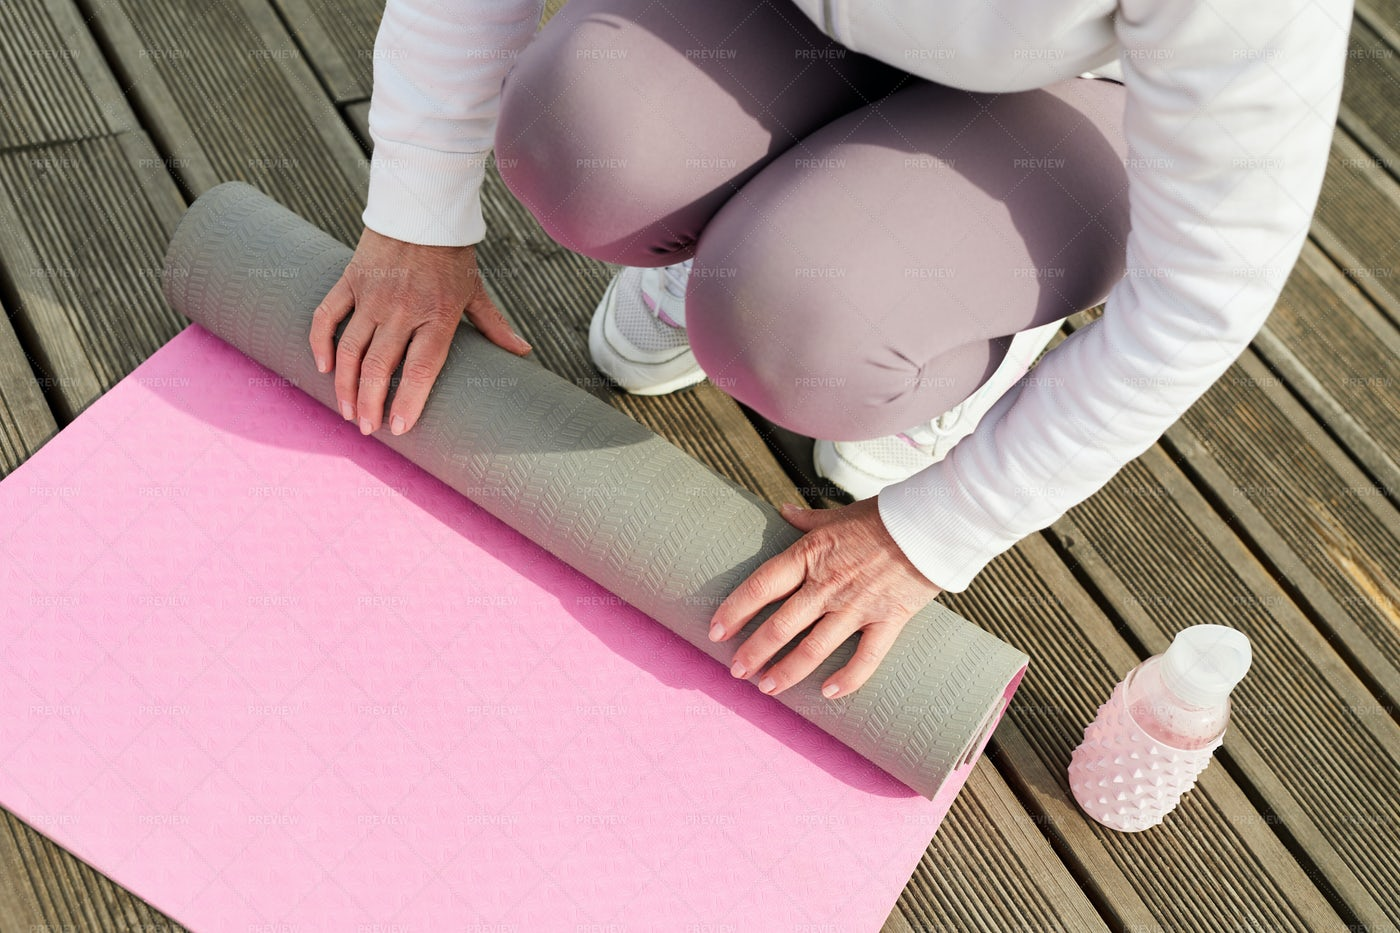 Woman Unrolling Yoga Mat: Stock Photos